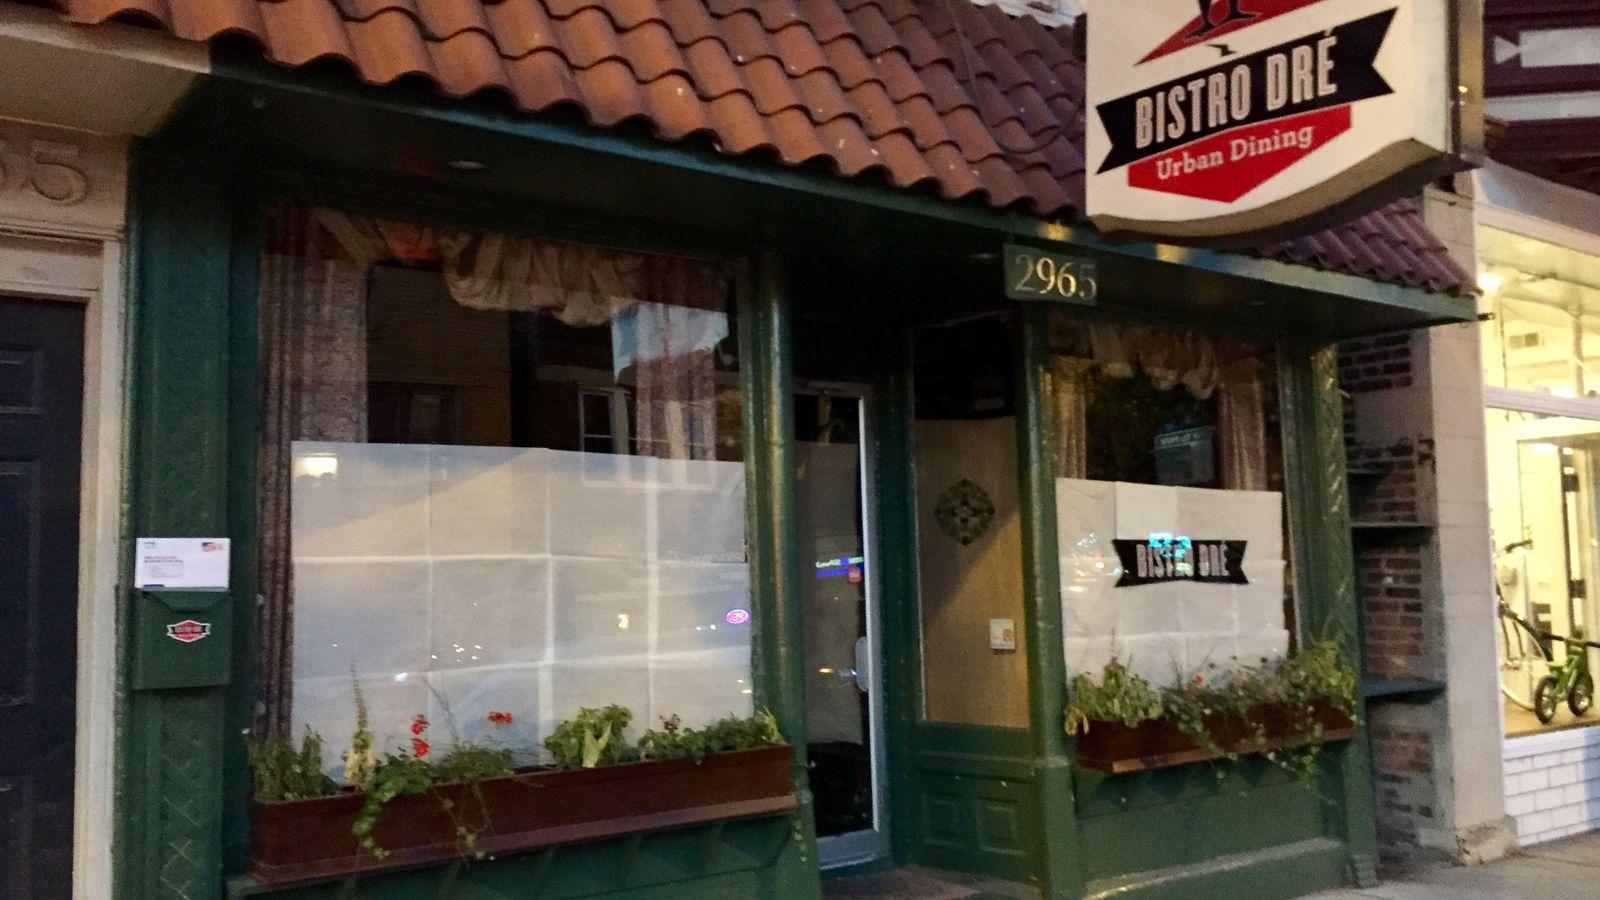 Bistro Dre: Bistro Dre, Popular Lakeview BYO Restaurant, Shutters On